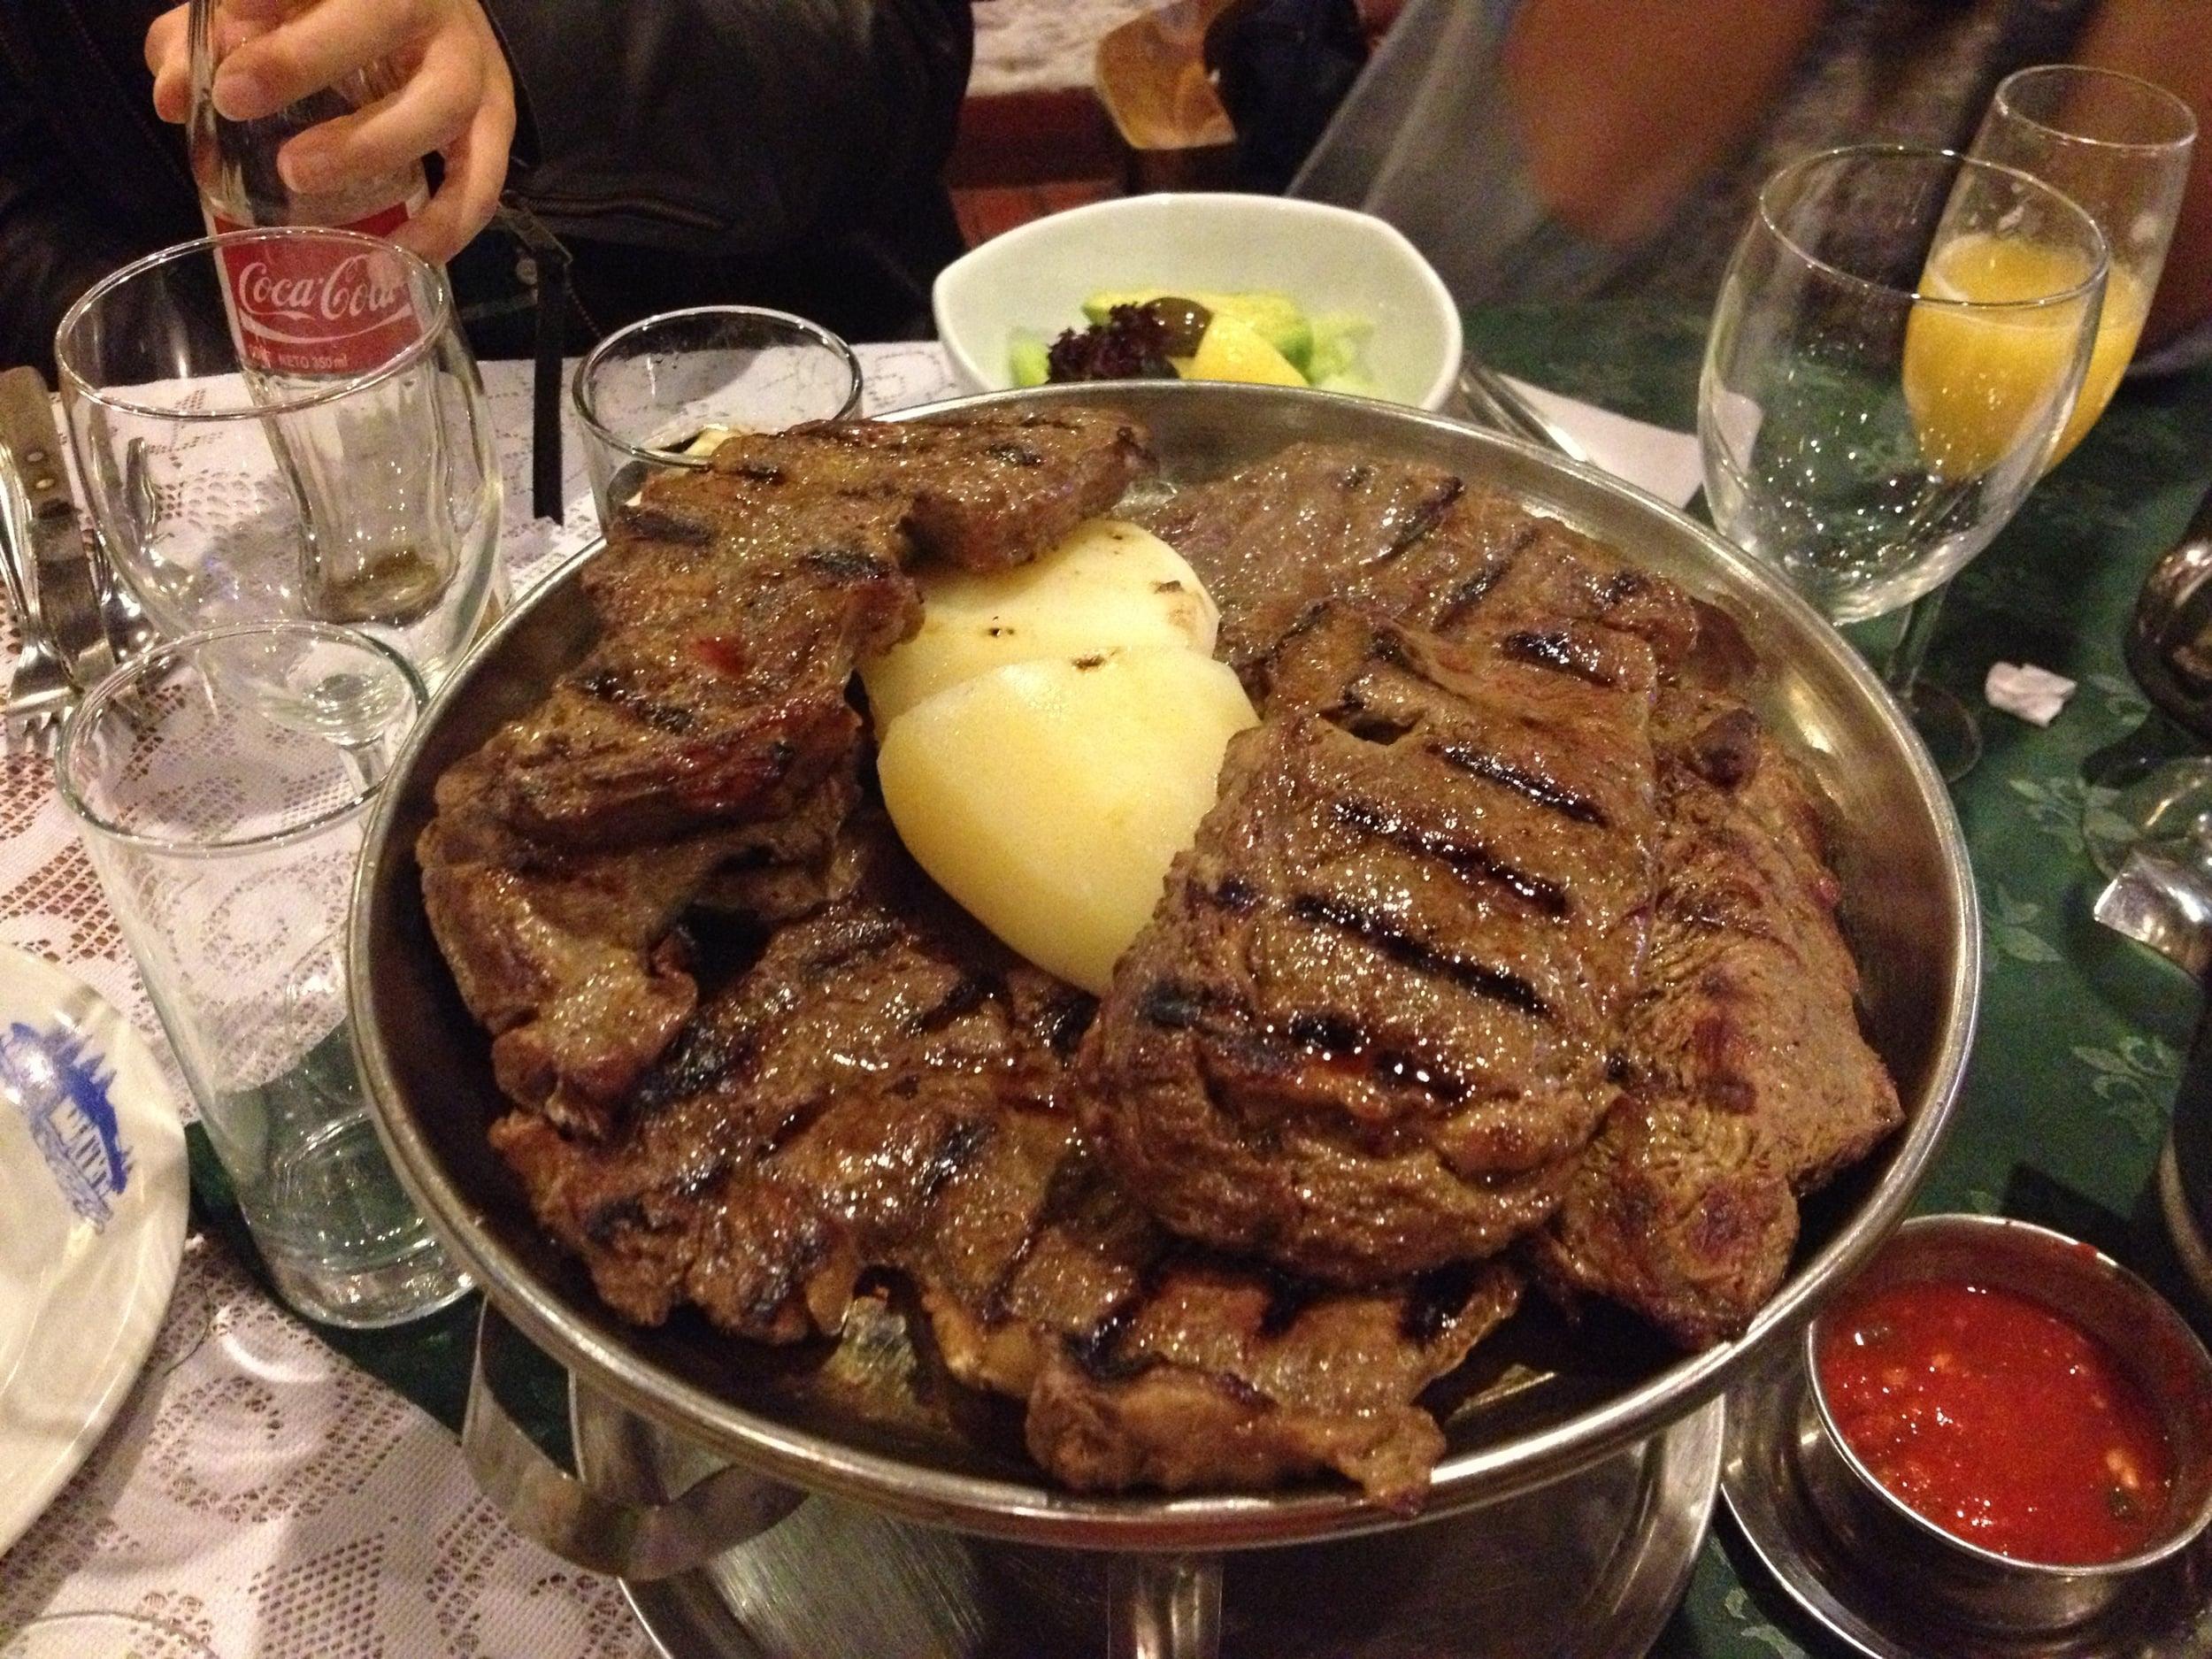 Steak, Steak, and More Steak